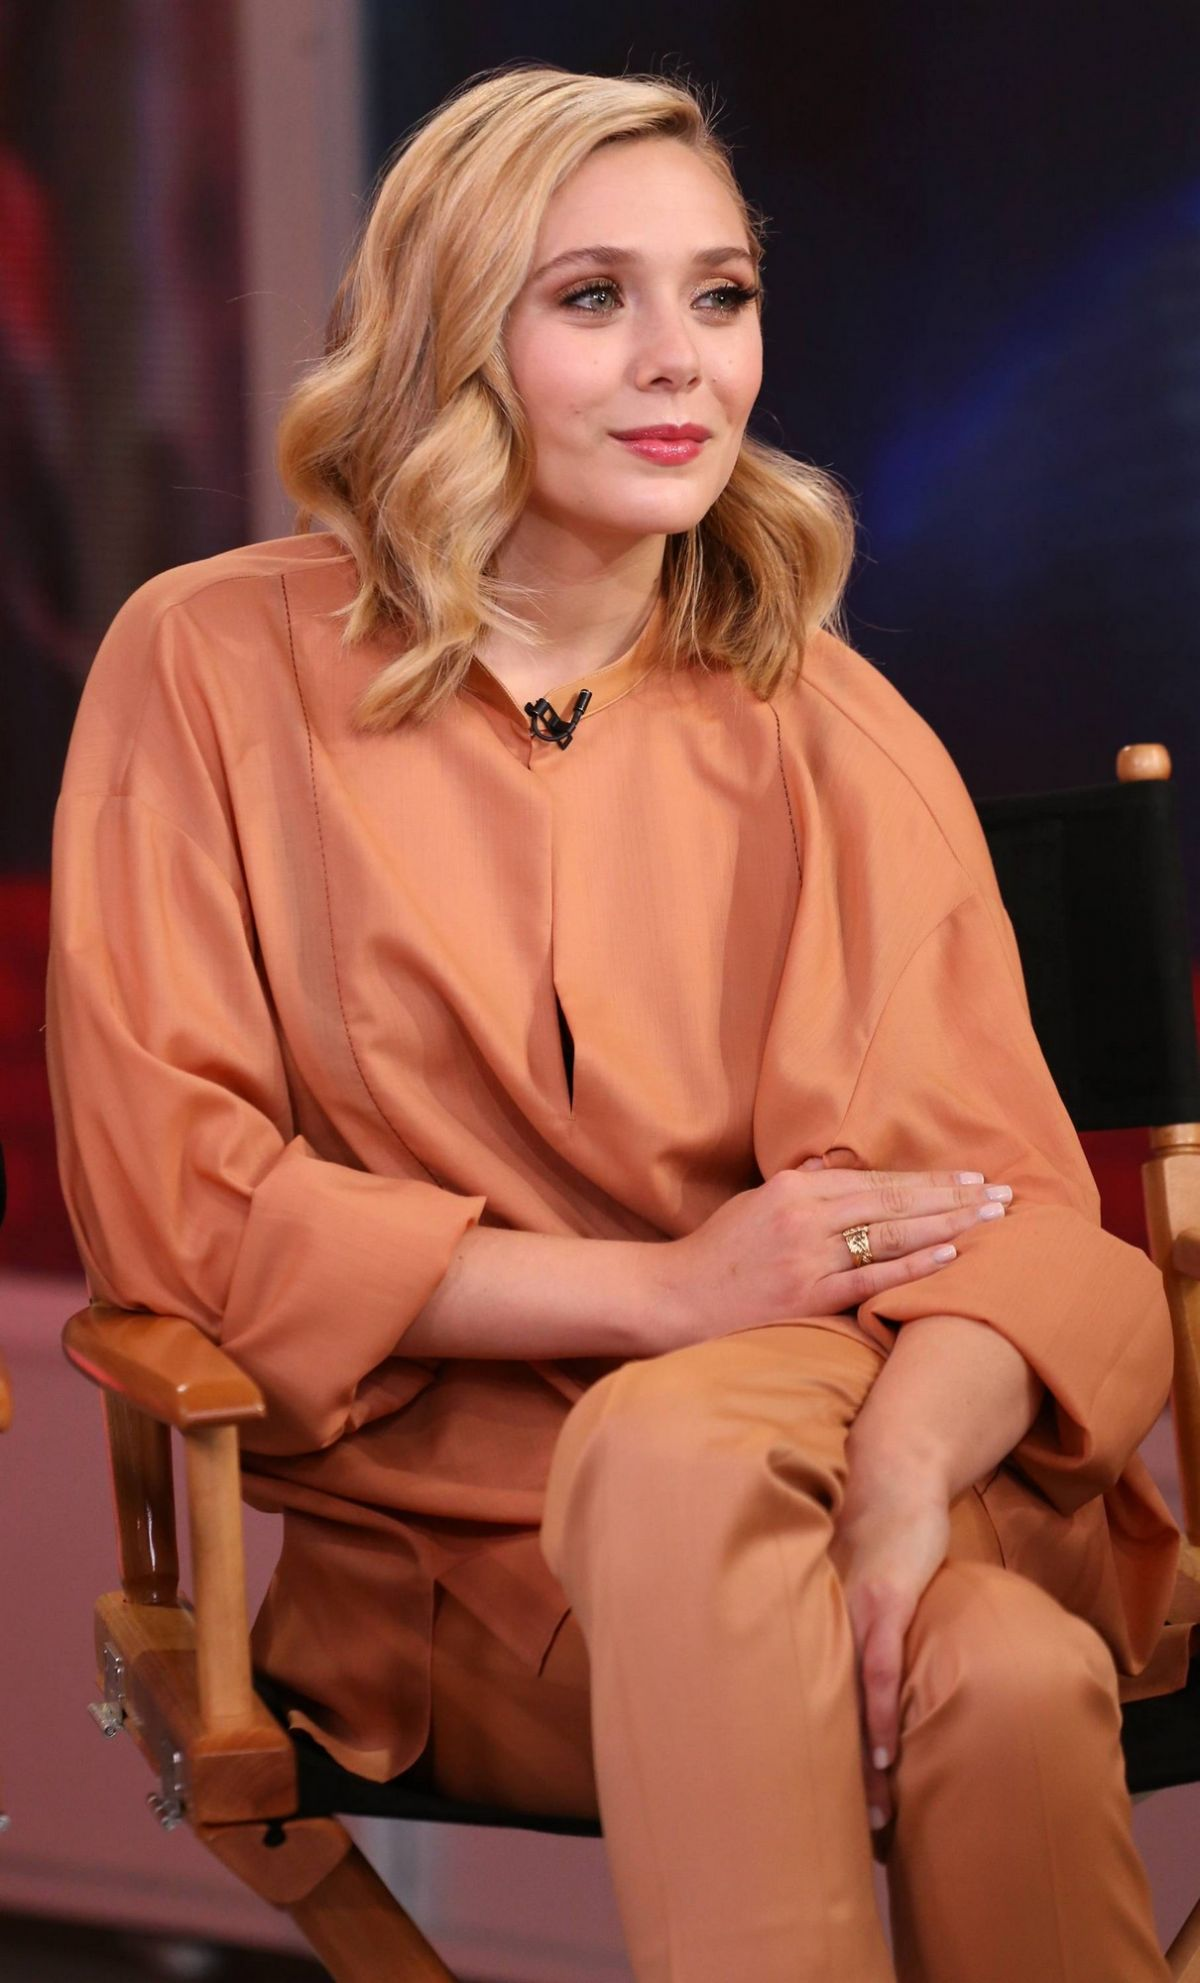 ELIZABETH OLSEN at Good Morning America in New York 05/01/2015